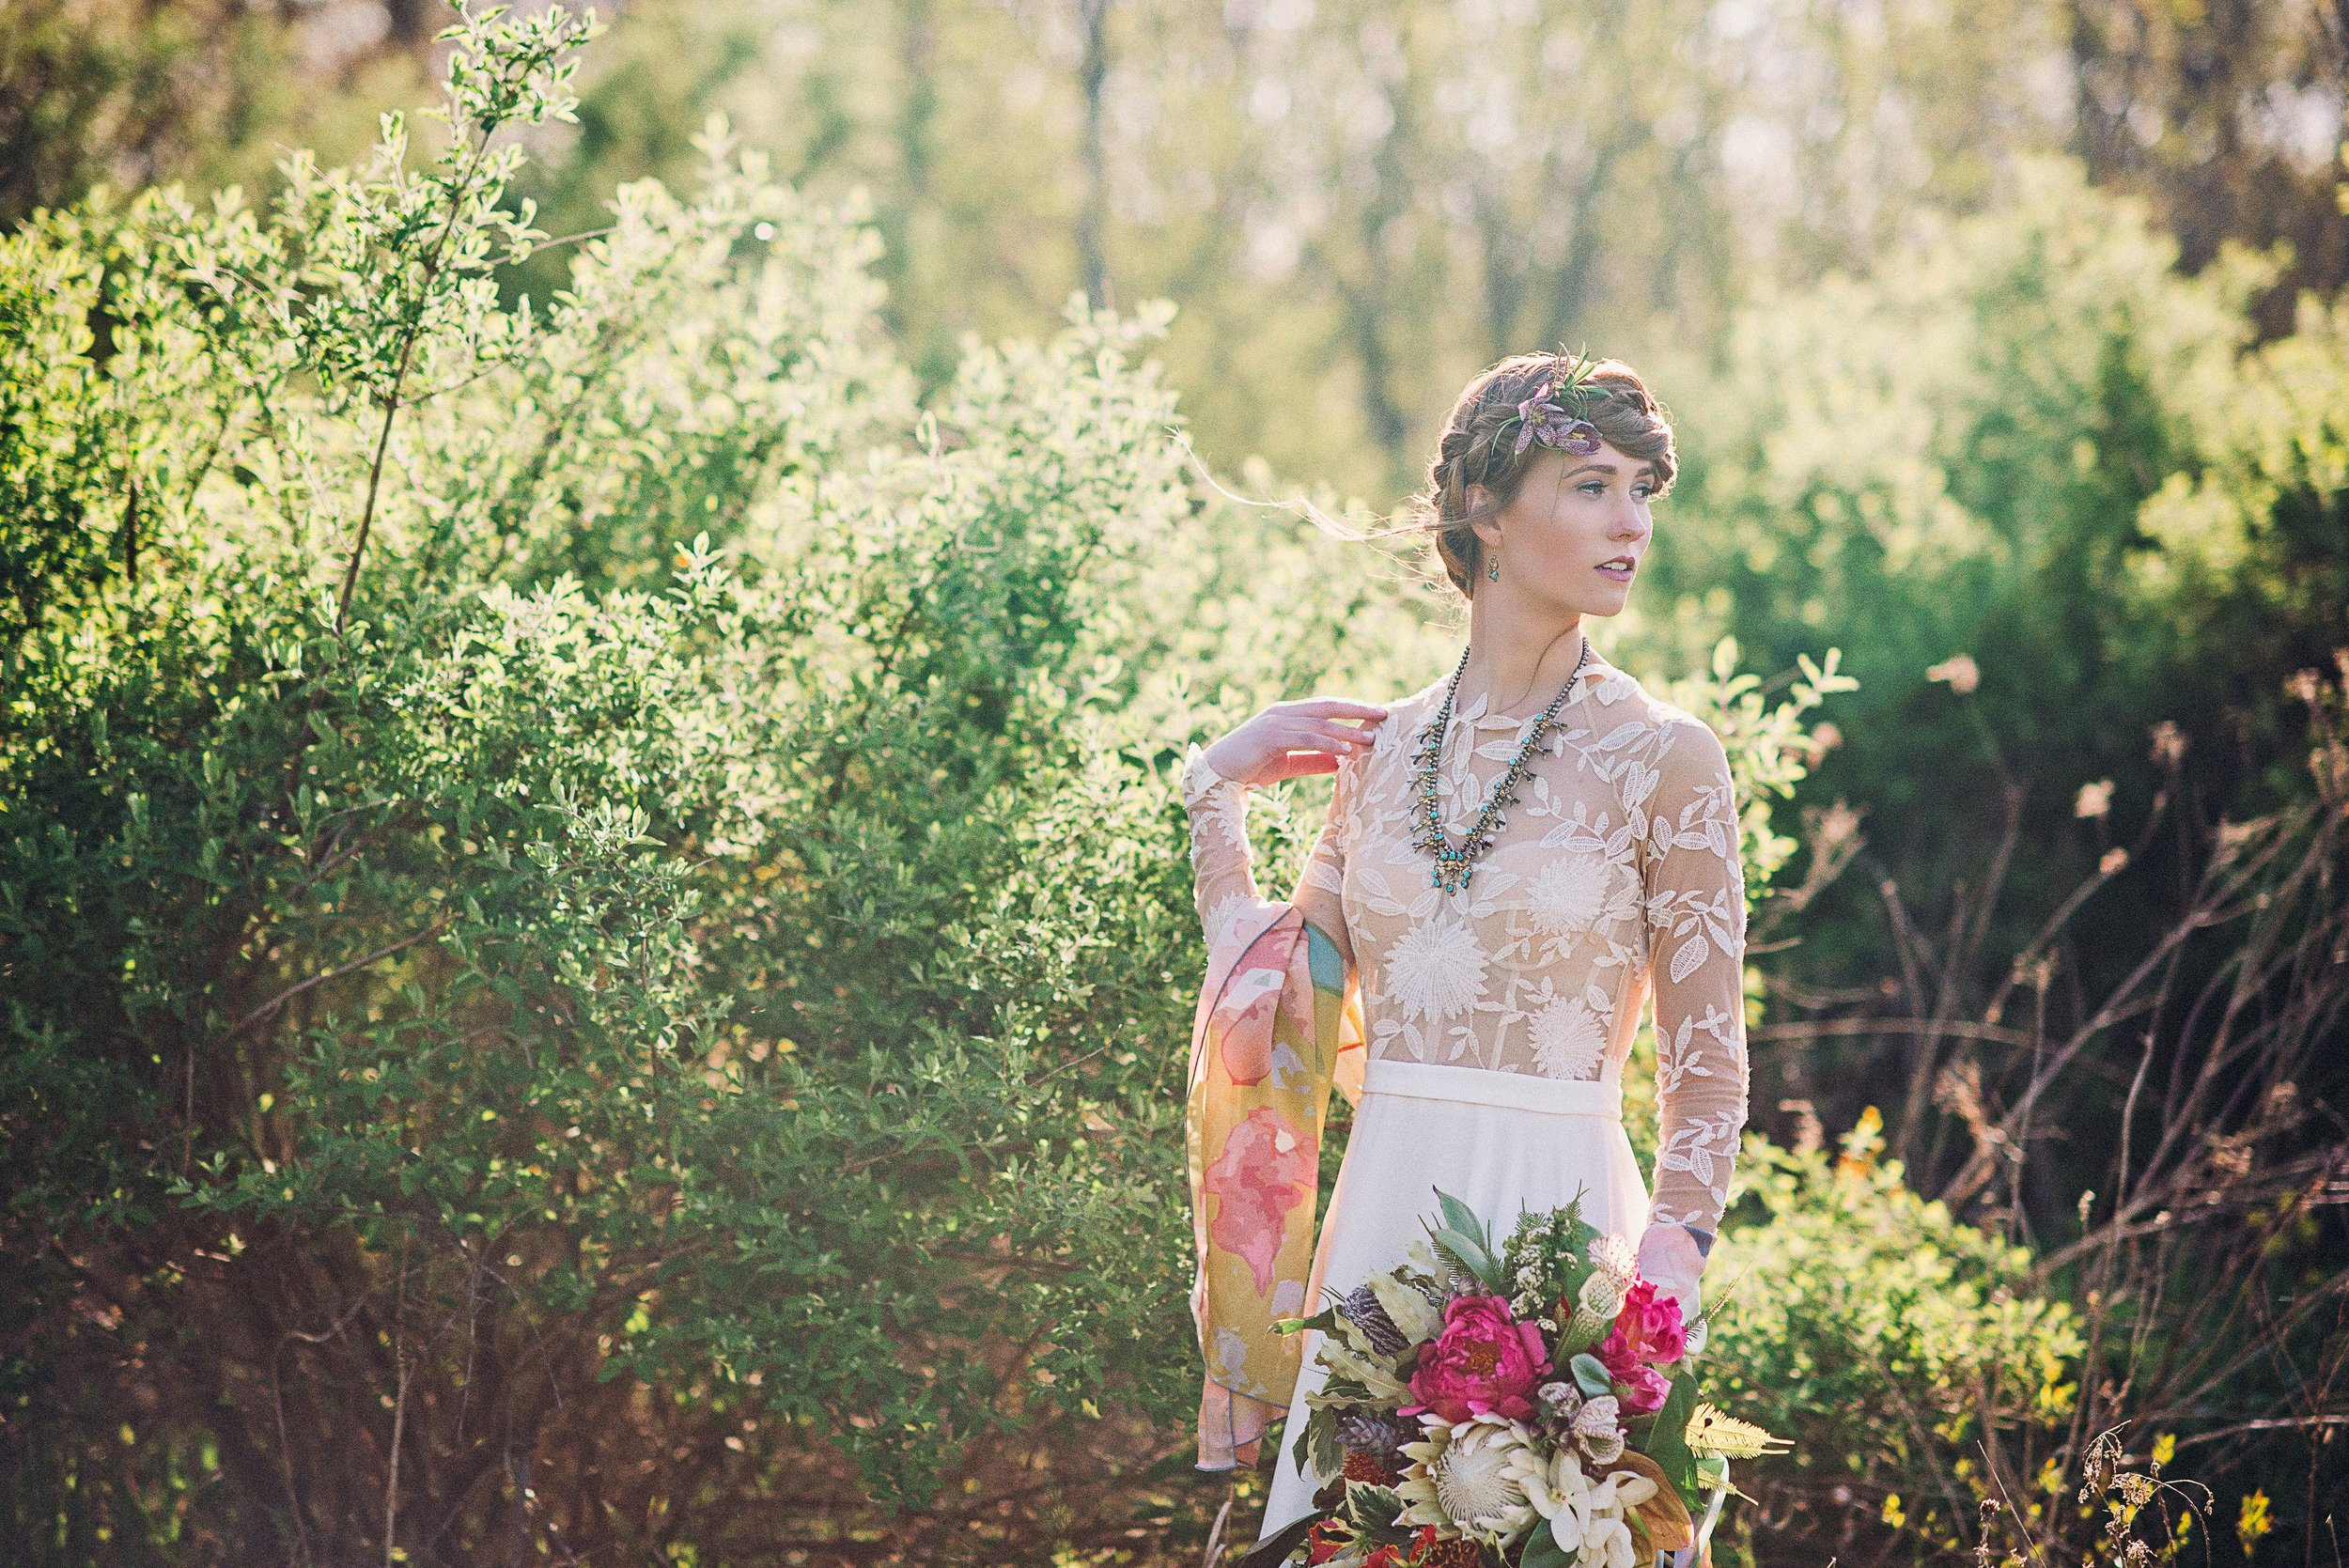 Alexandra-Elise-Photography-Ali-Reed-Film-Wedding-Photographer-Ithaca-New-York-Firelight-Camps-024.jpg